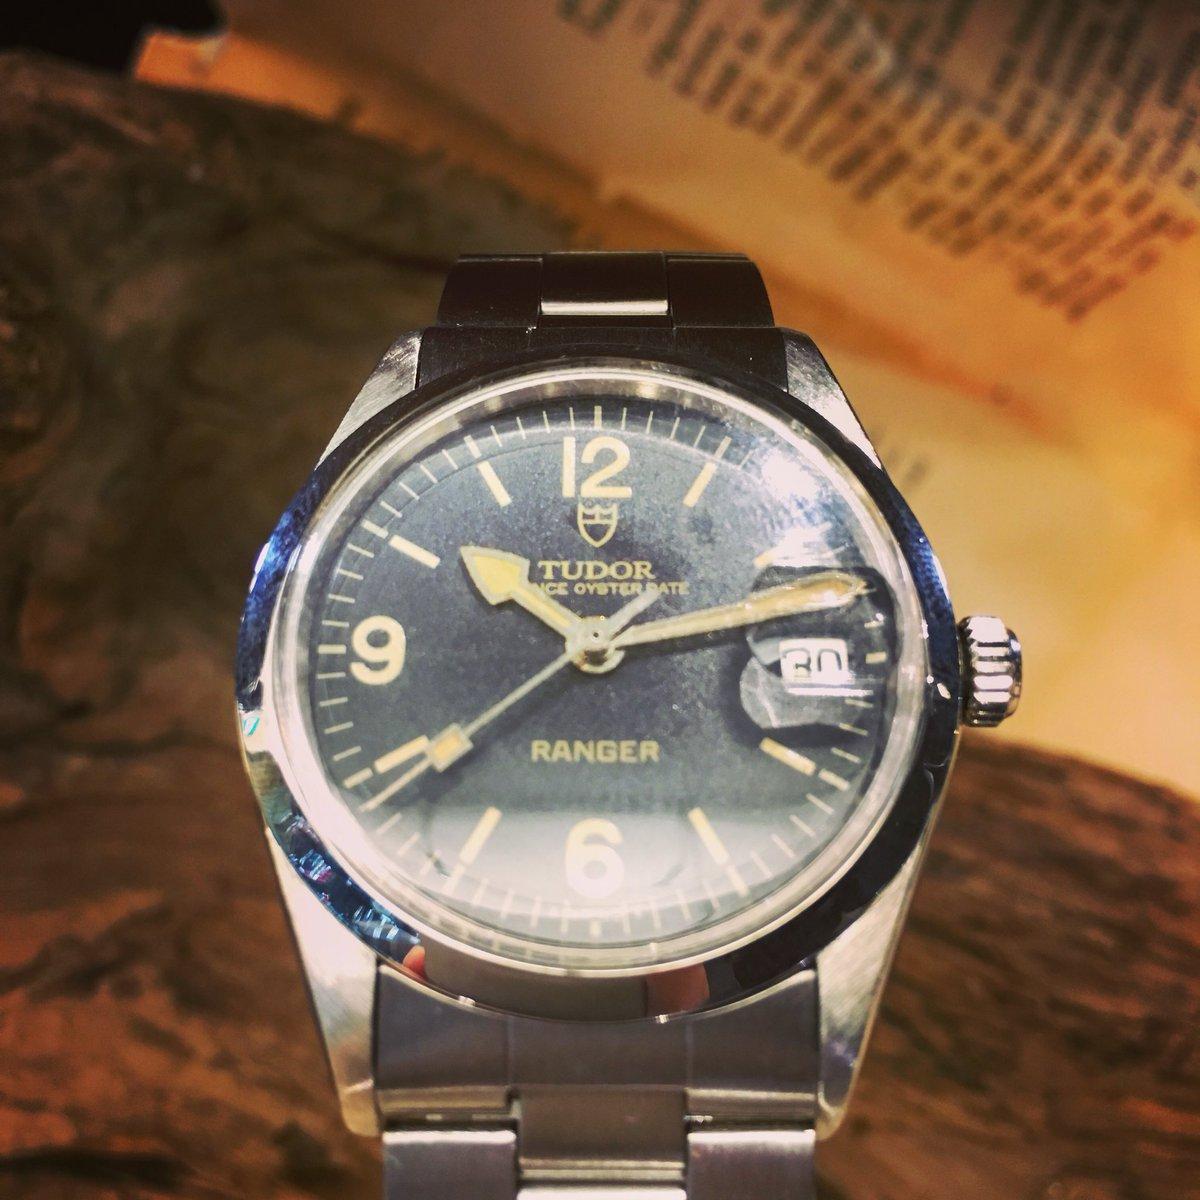 online store 24e03 730a0 高級腕時計専門店 BELLE MONDE on Twitter: